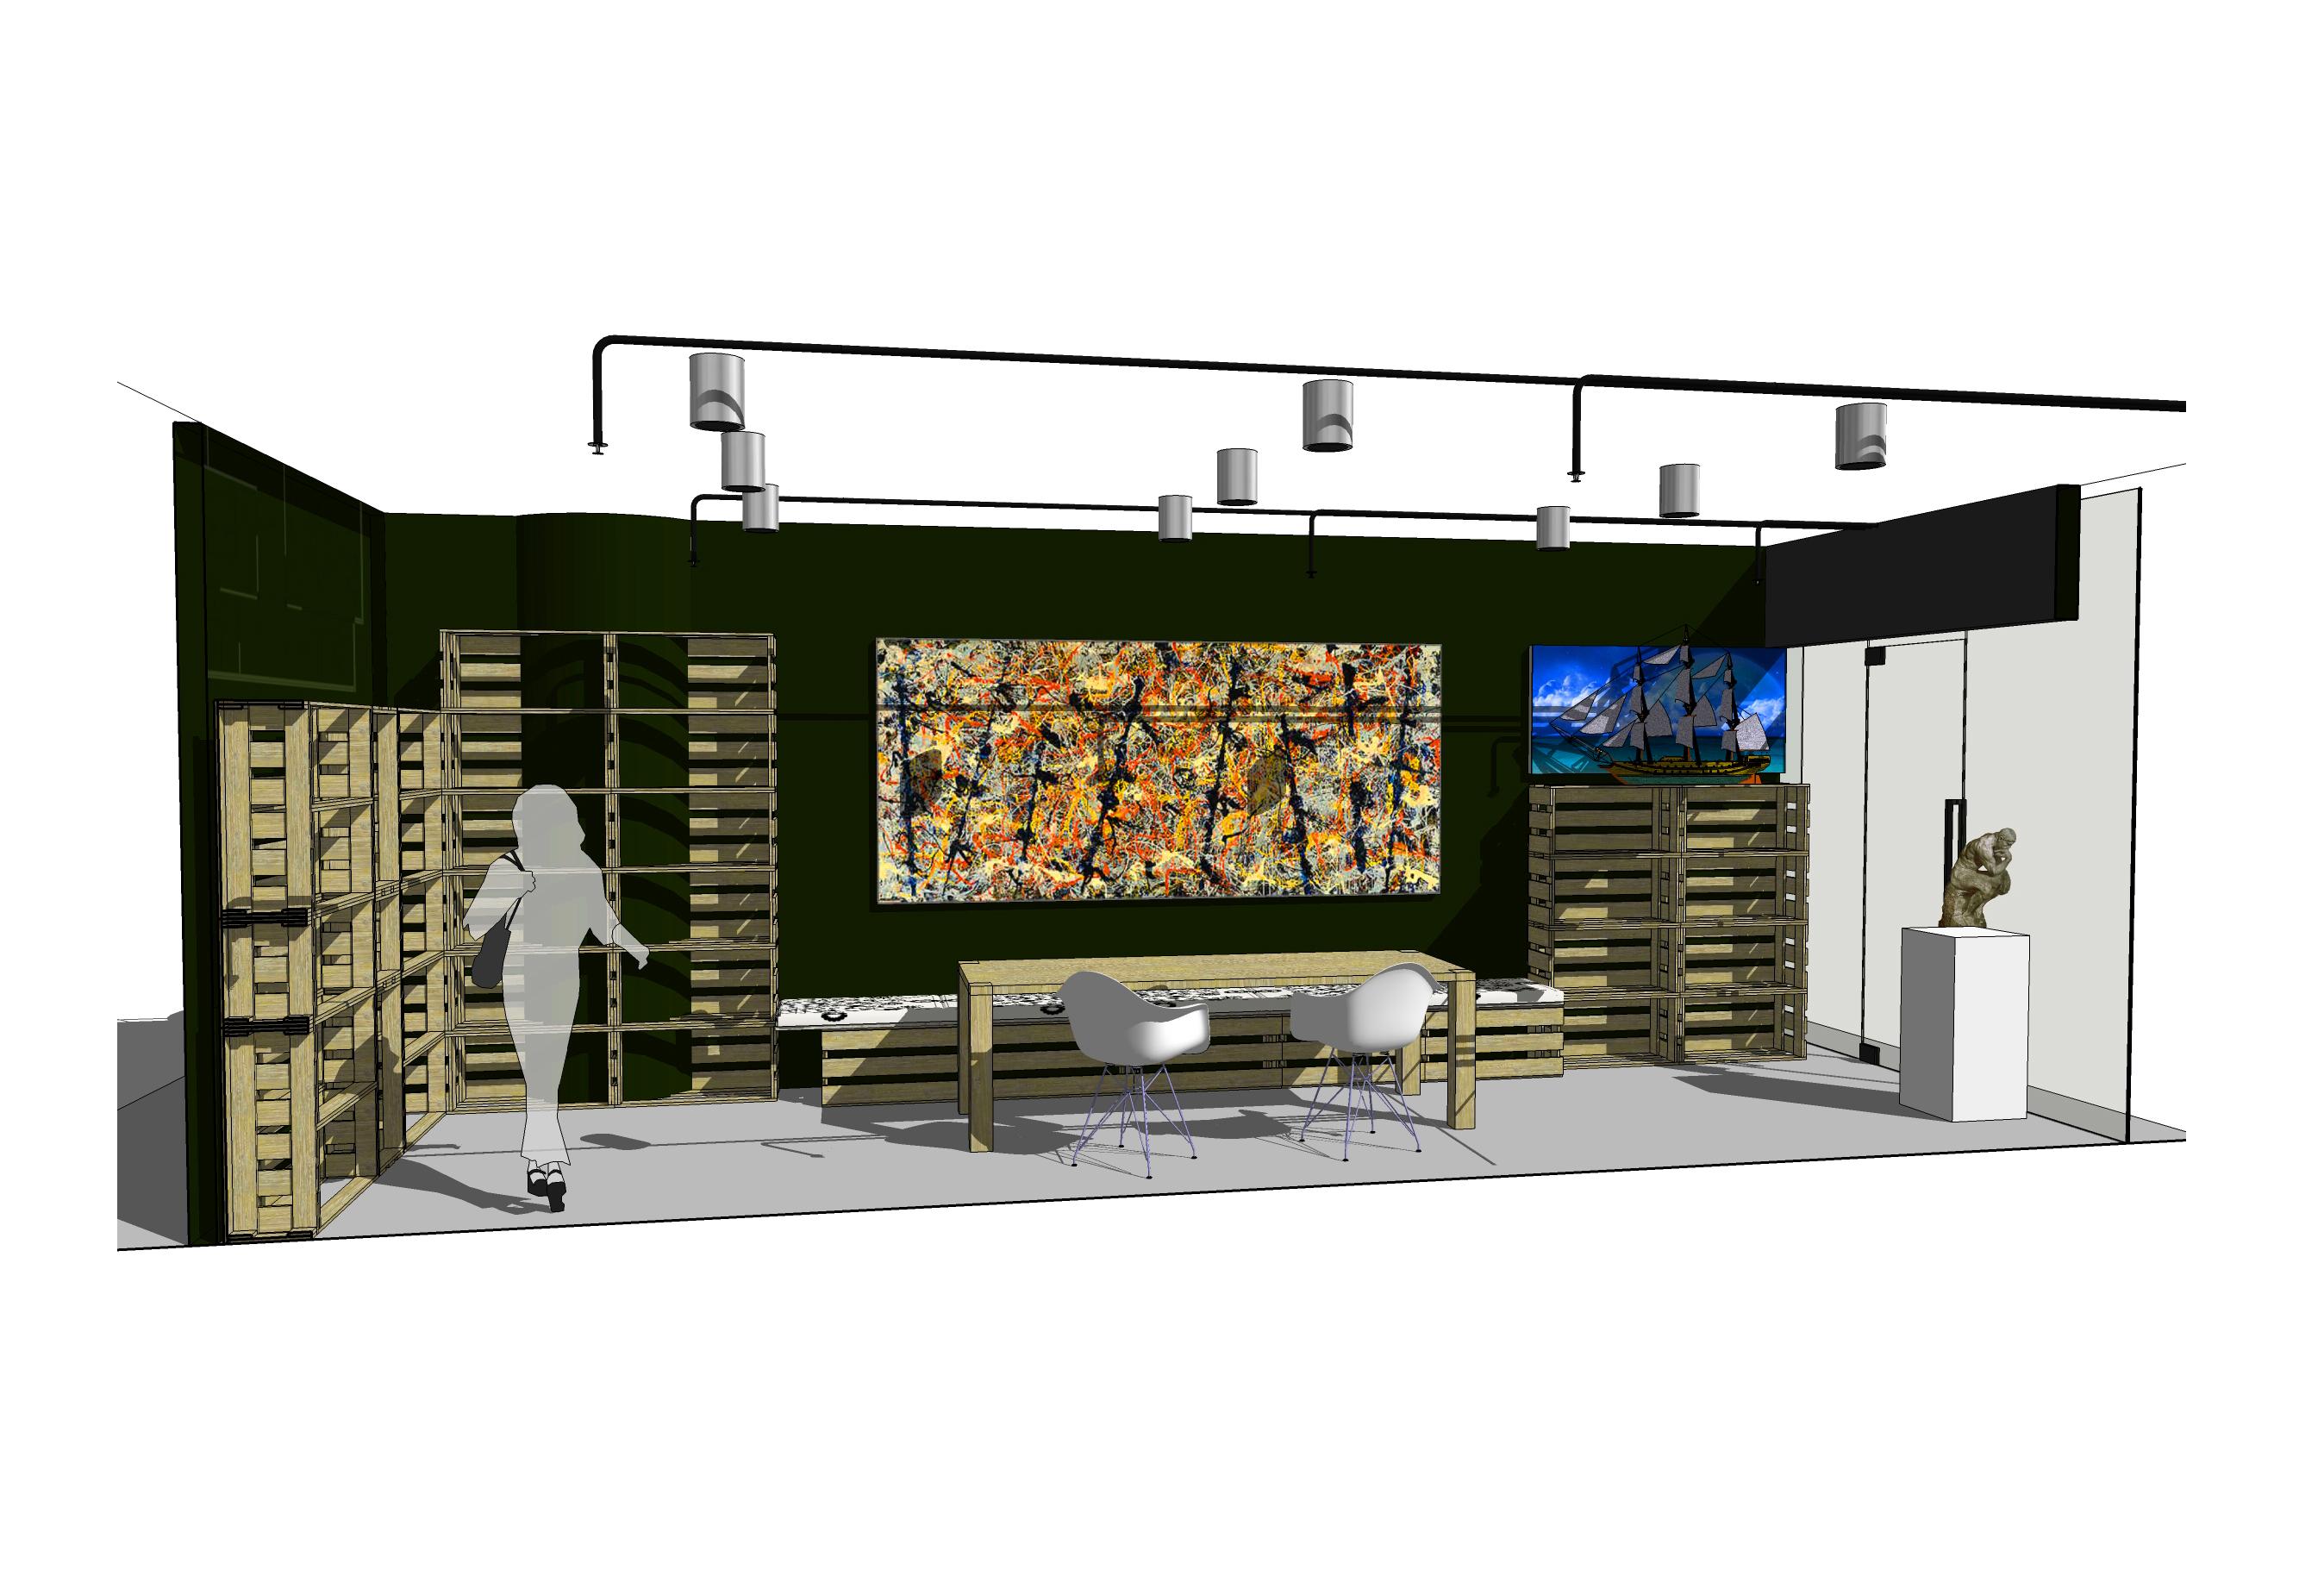 10DESIGN interior design goon studio photo paint shop retail commercial design 04